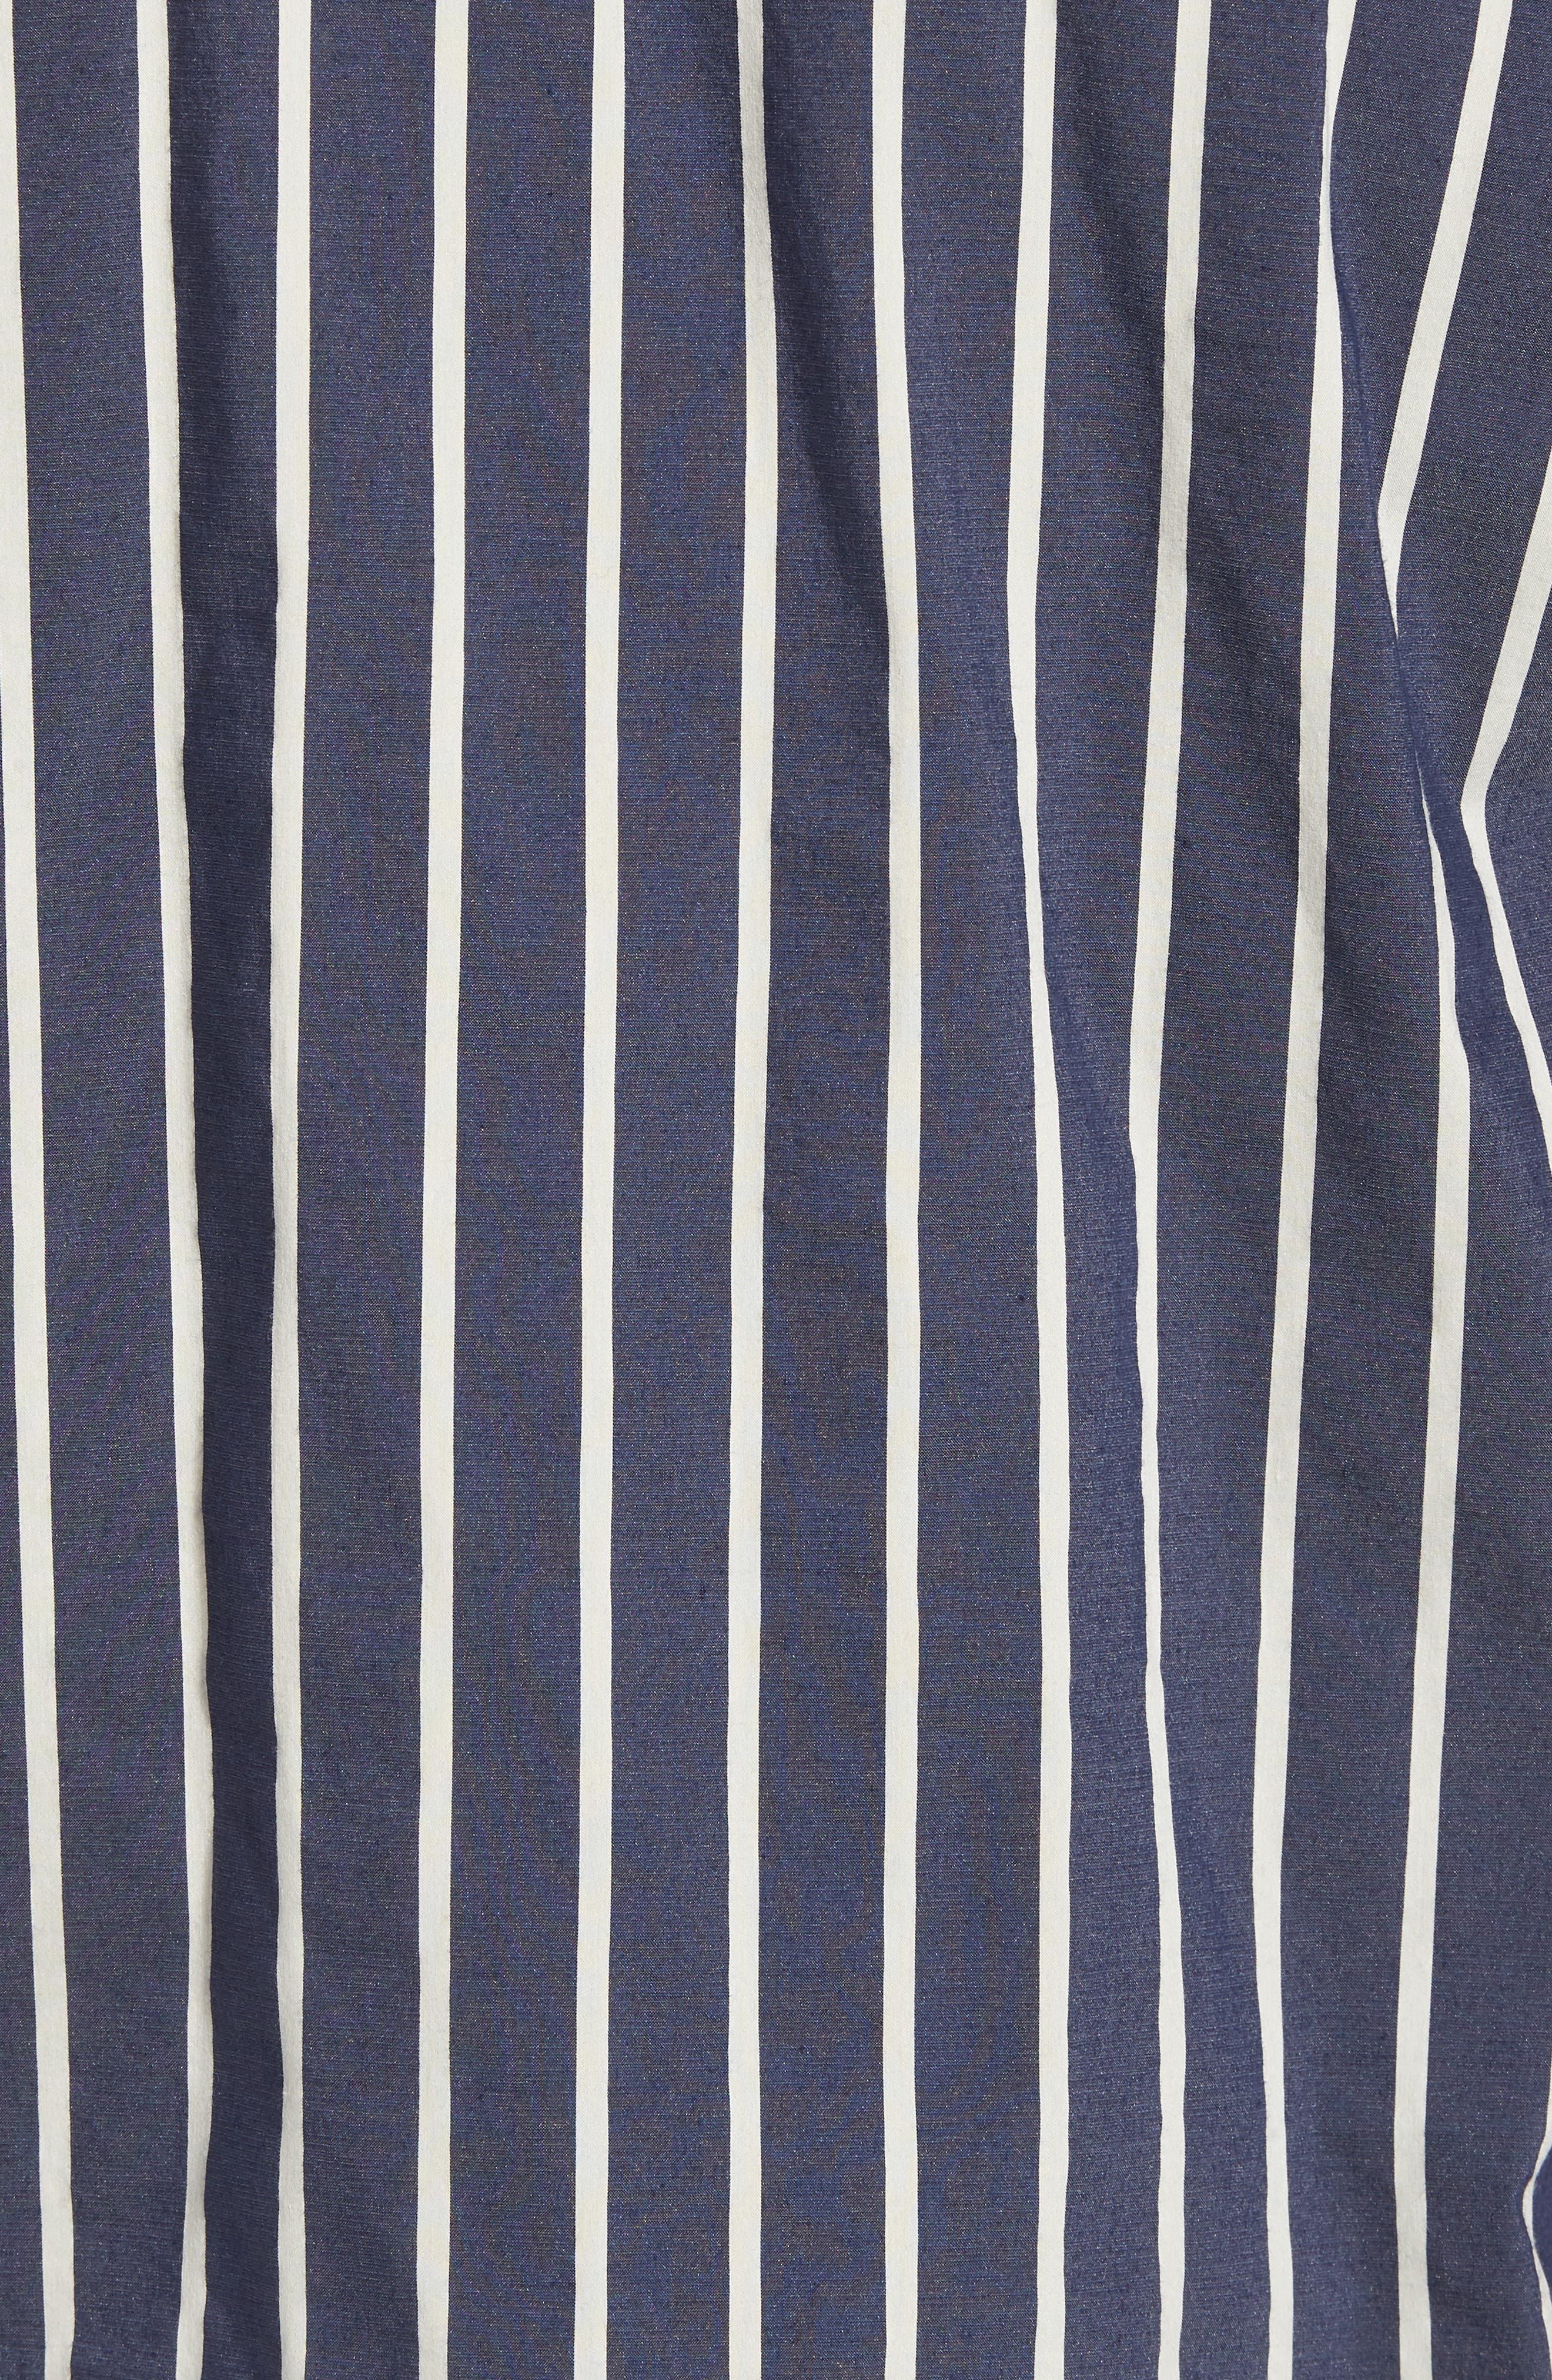 Regular Fit Stretch Short Sleeve Sport Shirt,                             Alternate thumbnail 5, color,                             463